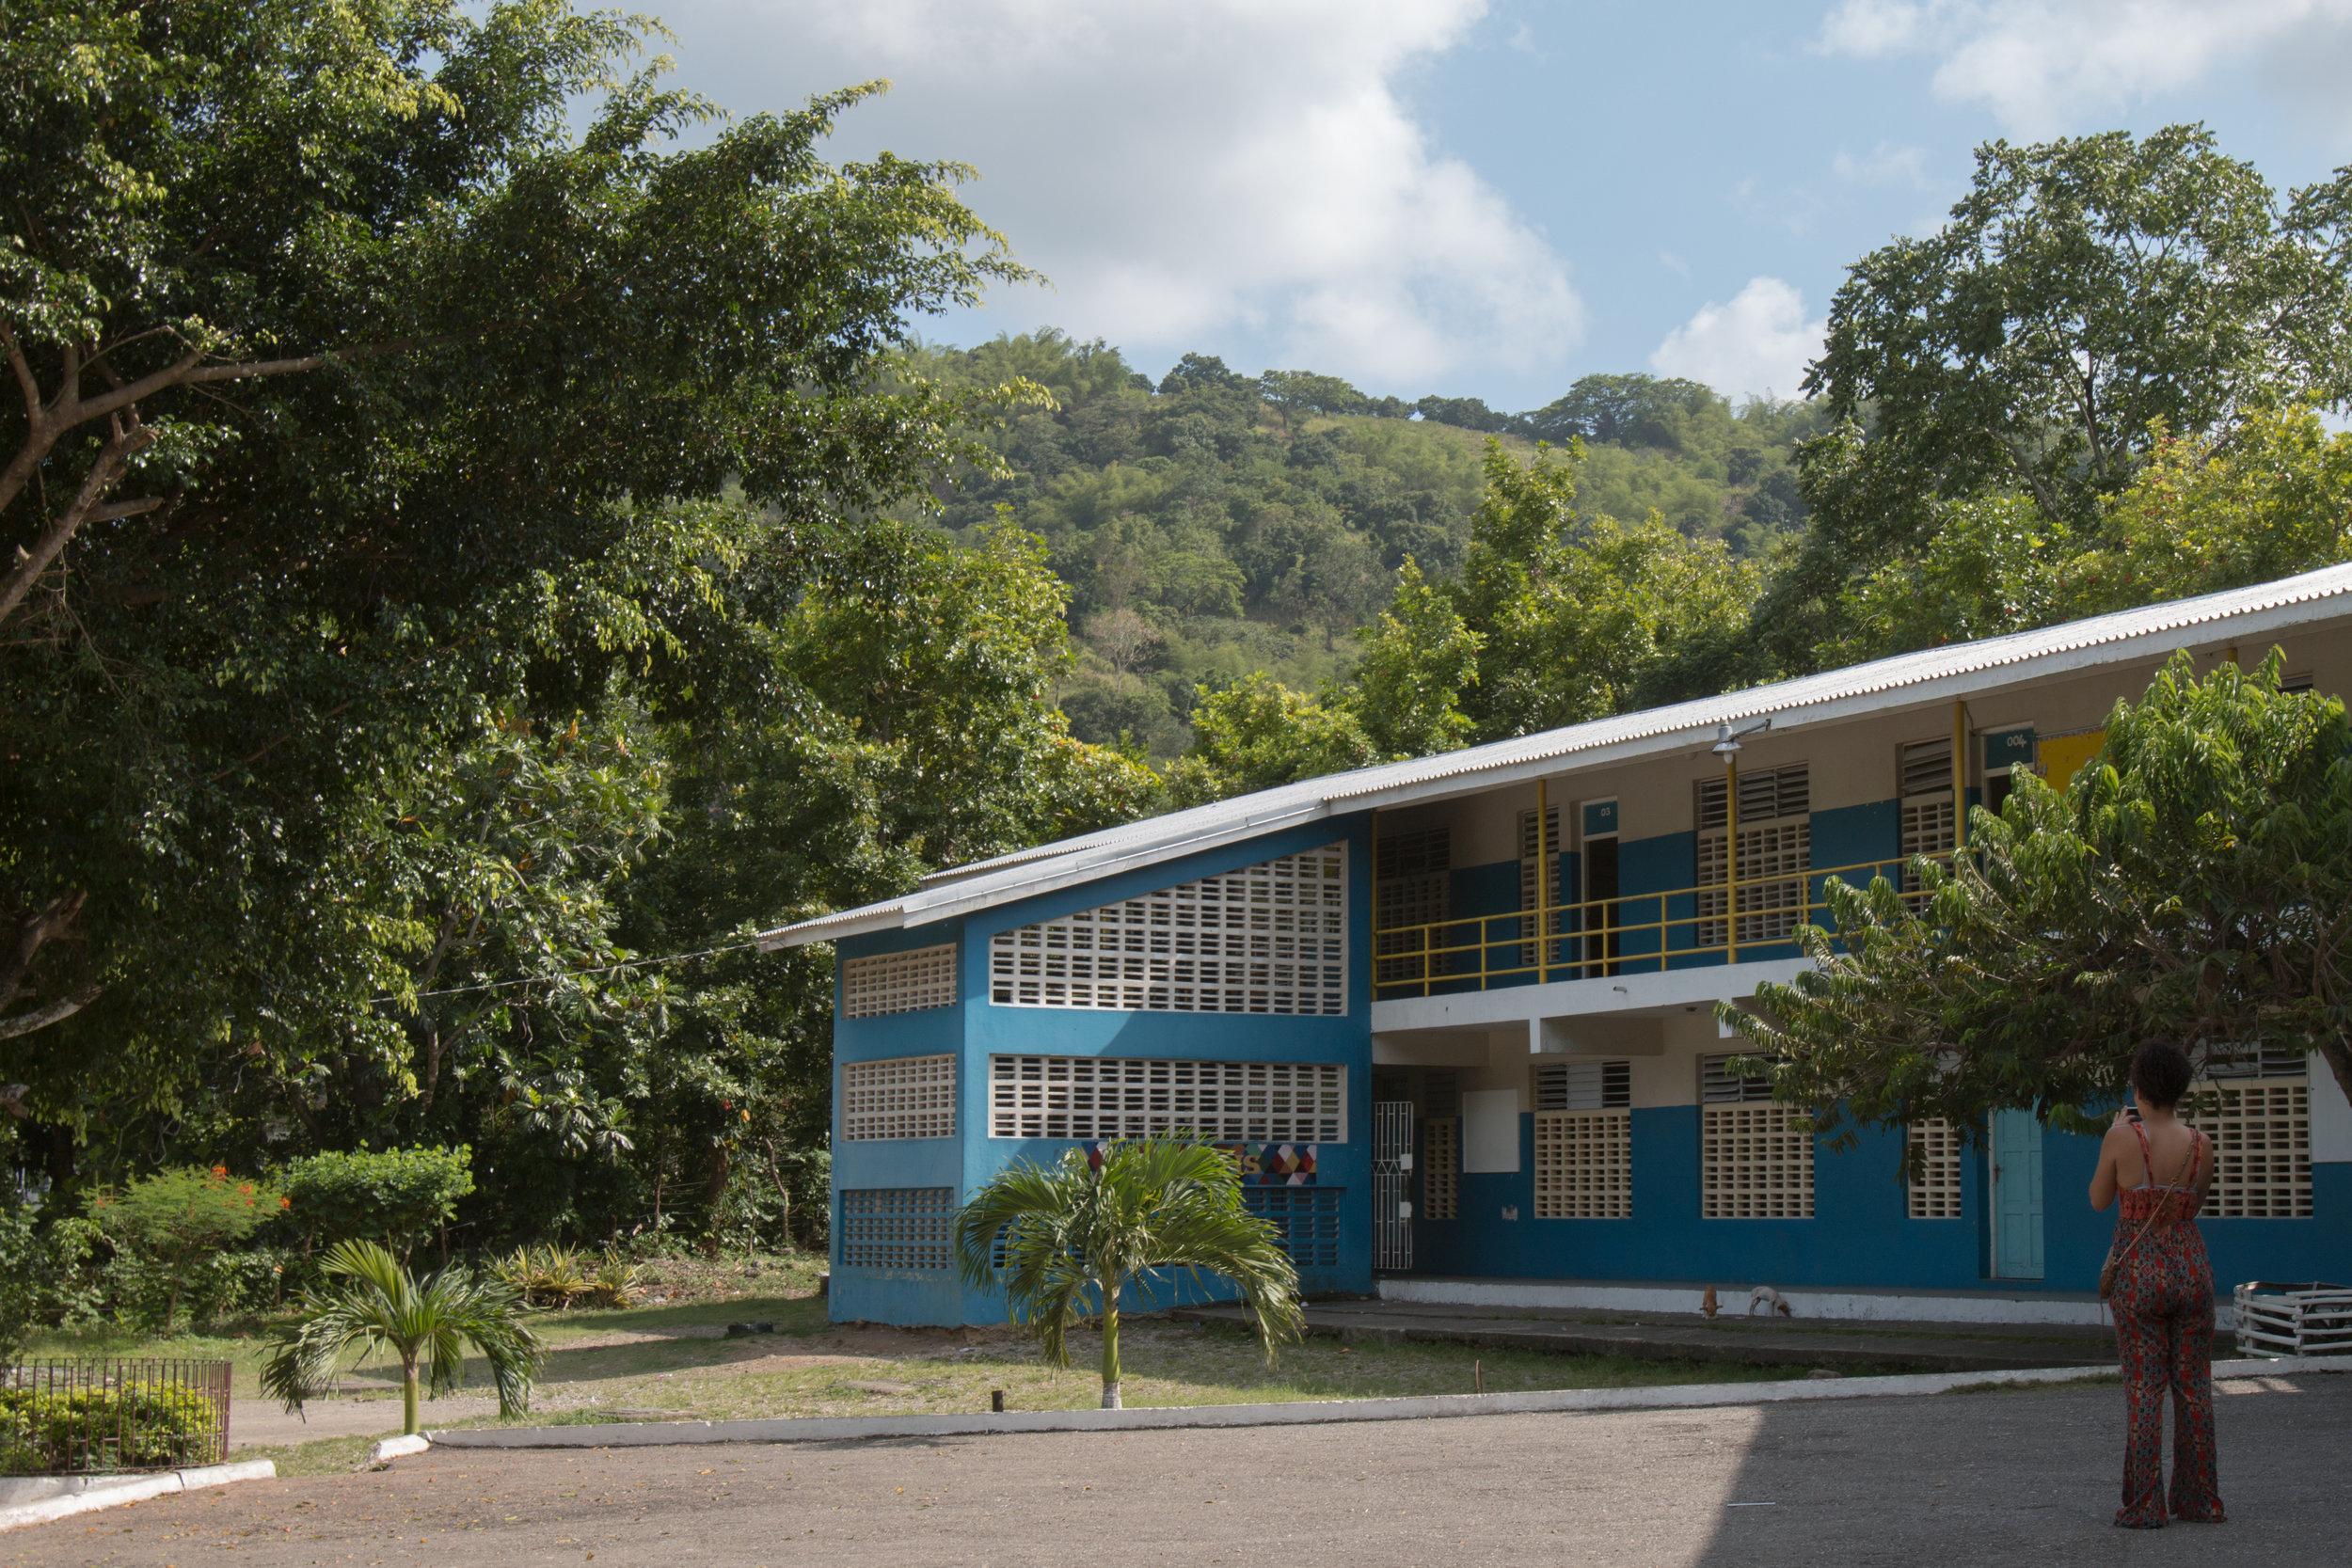 Jamaica edits for blog-19.jpg